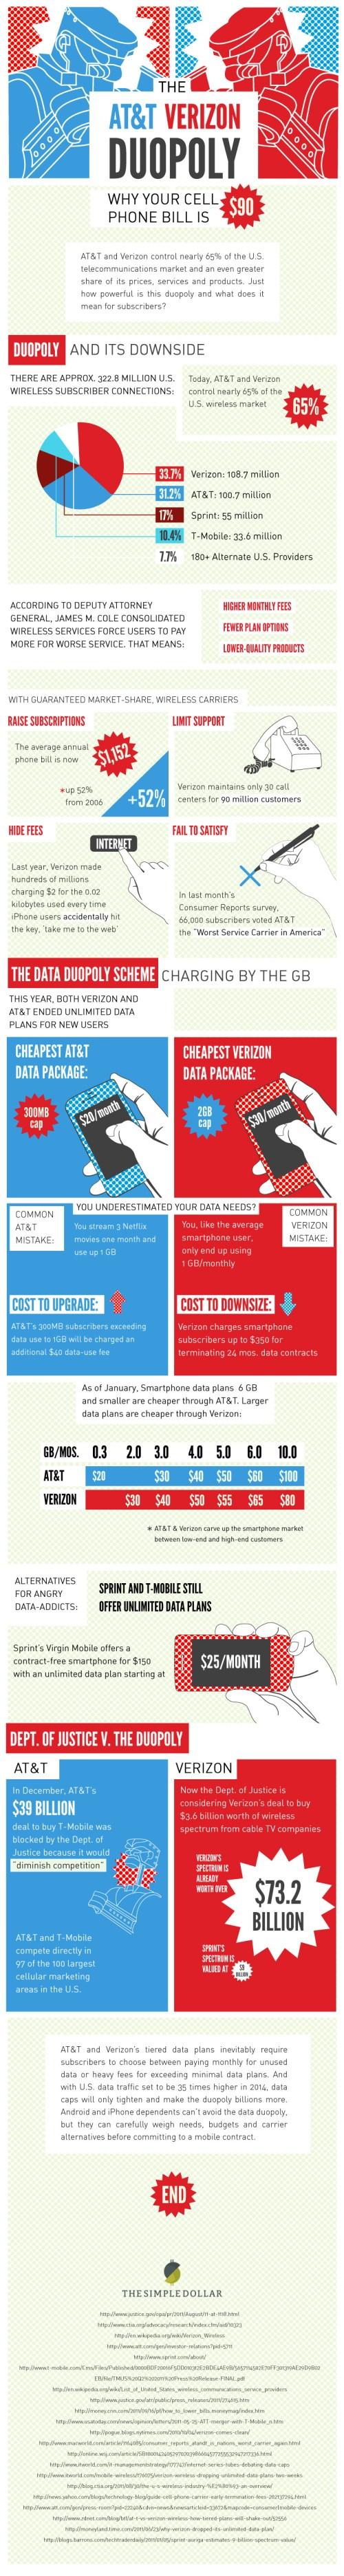 Verizon vs. AT&T Infographic